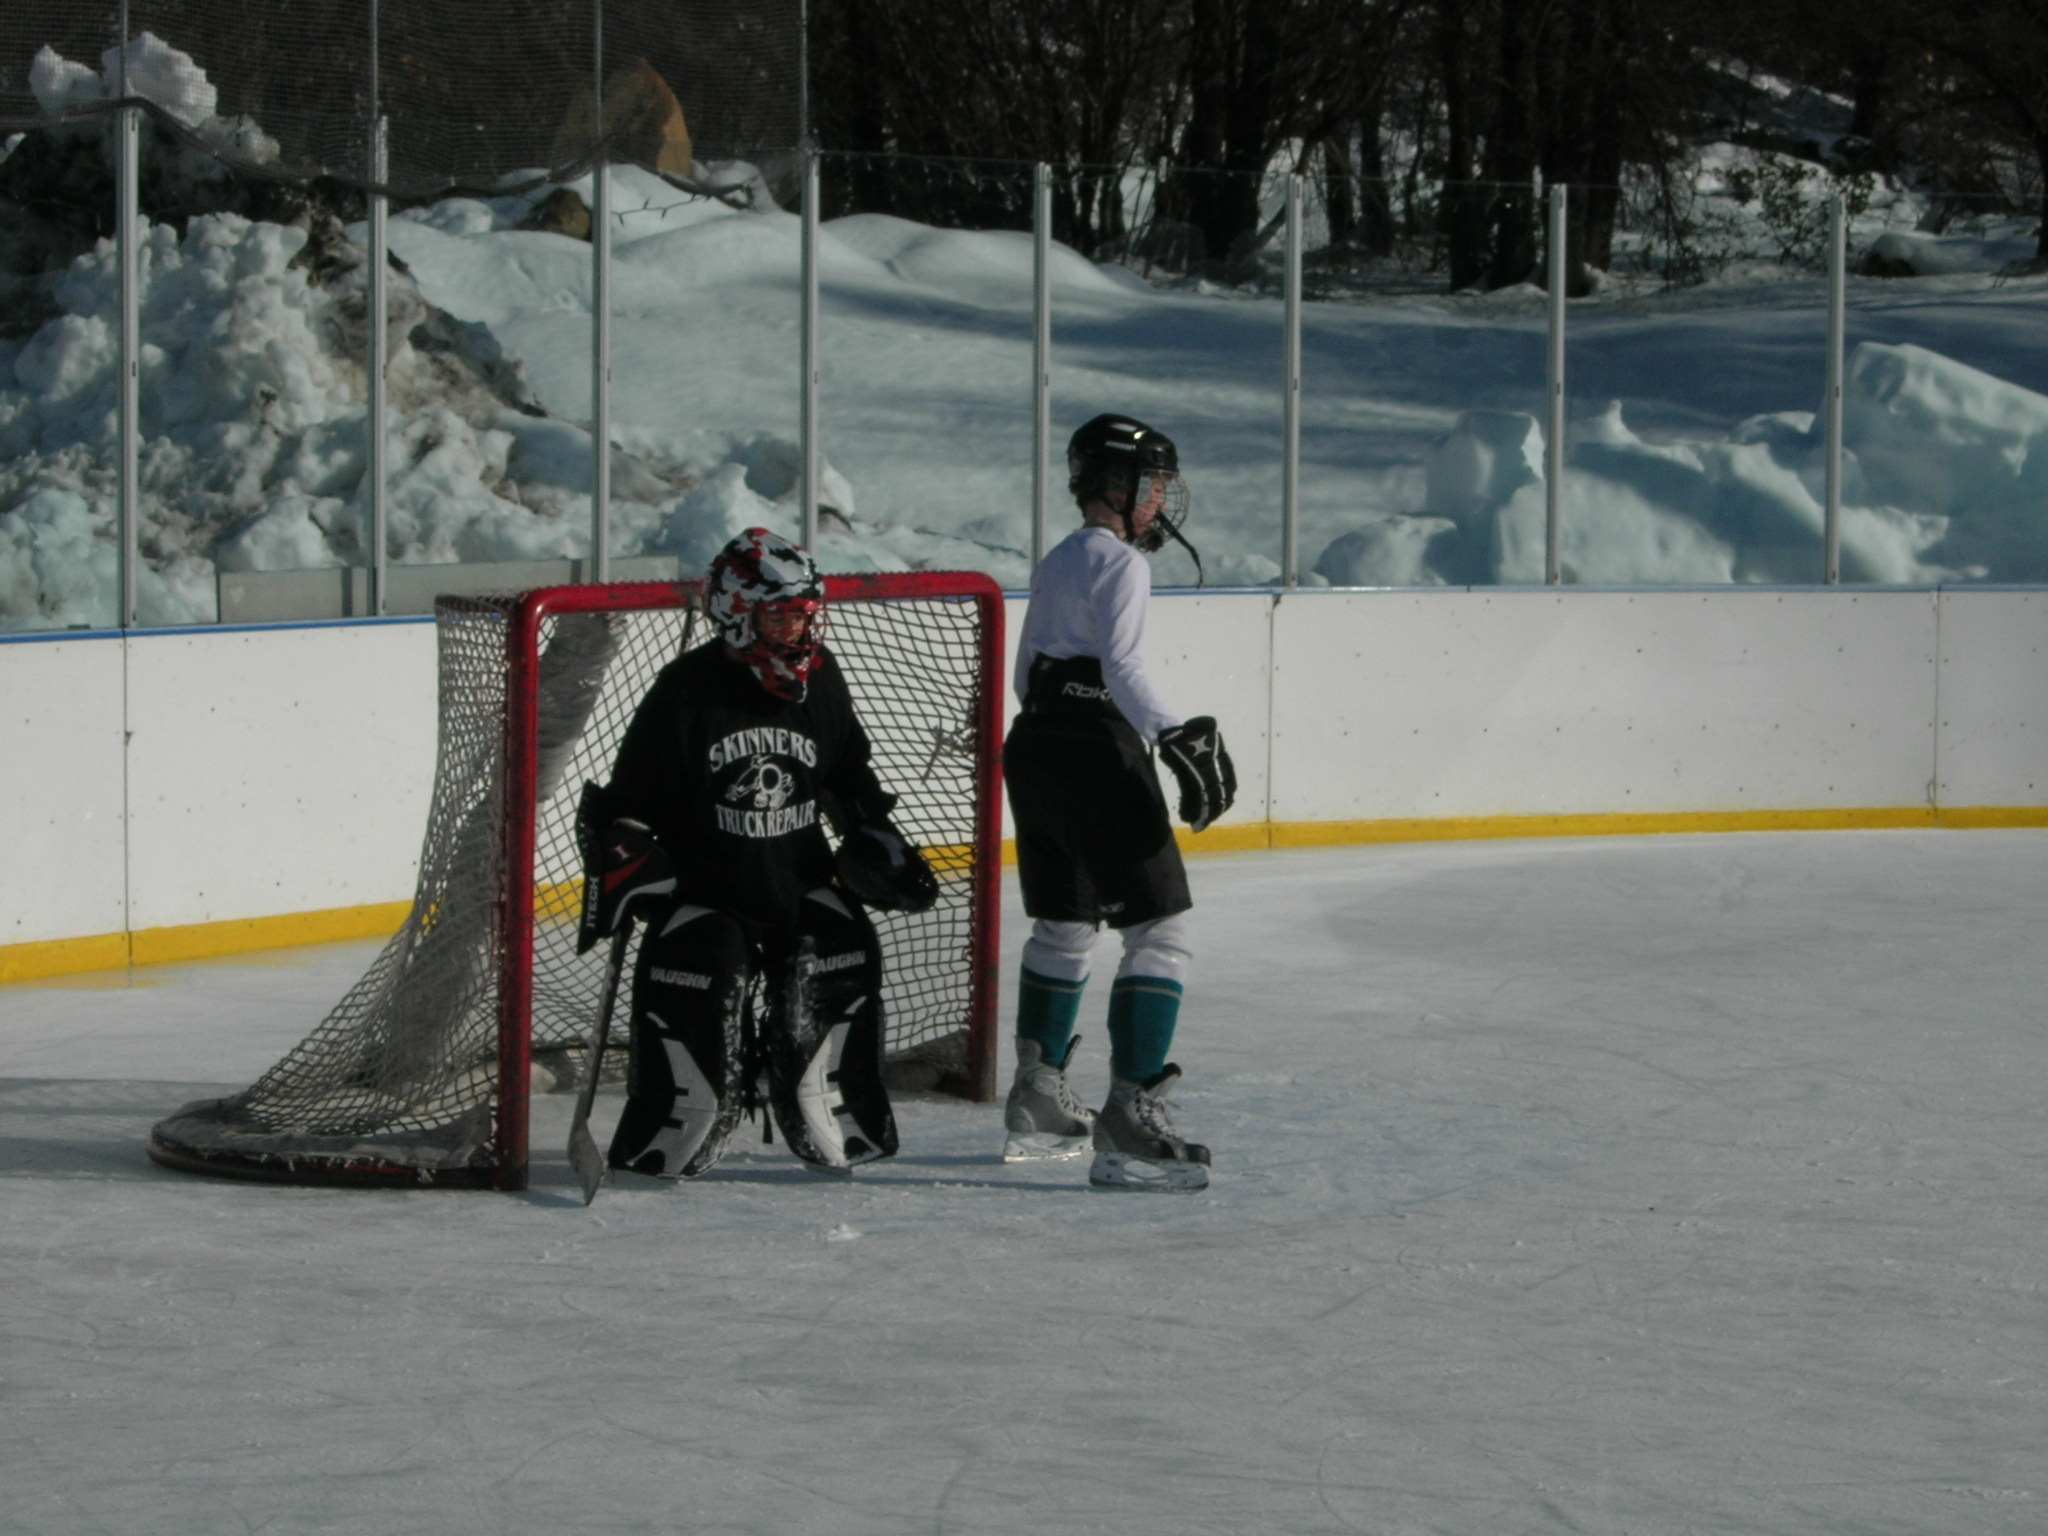 Mt Shasta Ca >> Hockey — Friends of Siskiyou Ice Rink in Mt. Shasta, CA